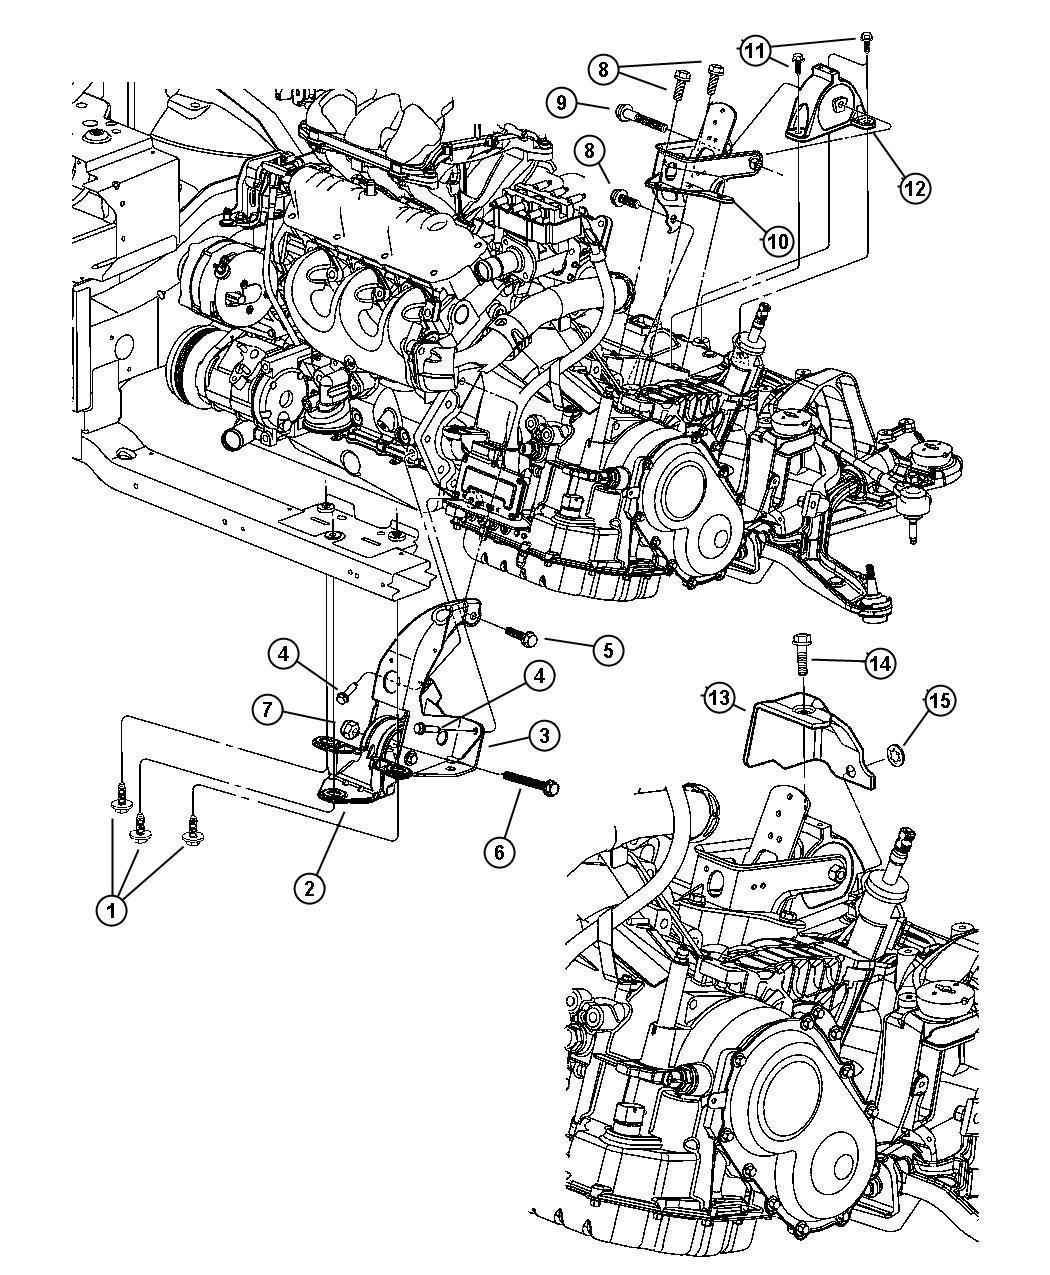 Dodge Grand Caravan Engine Diagram